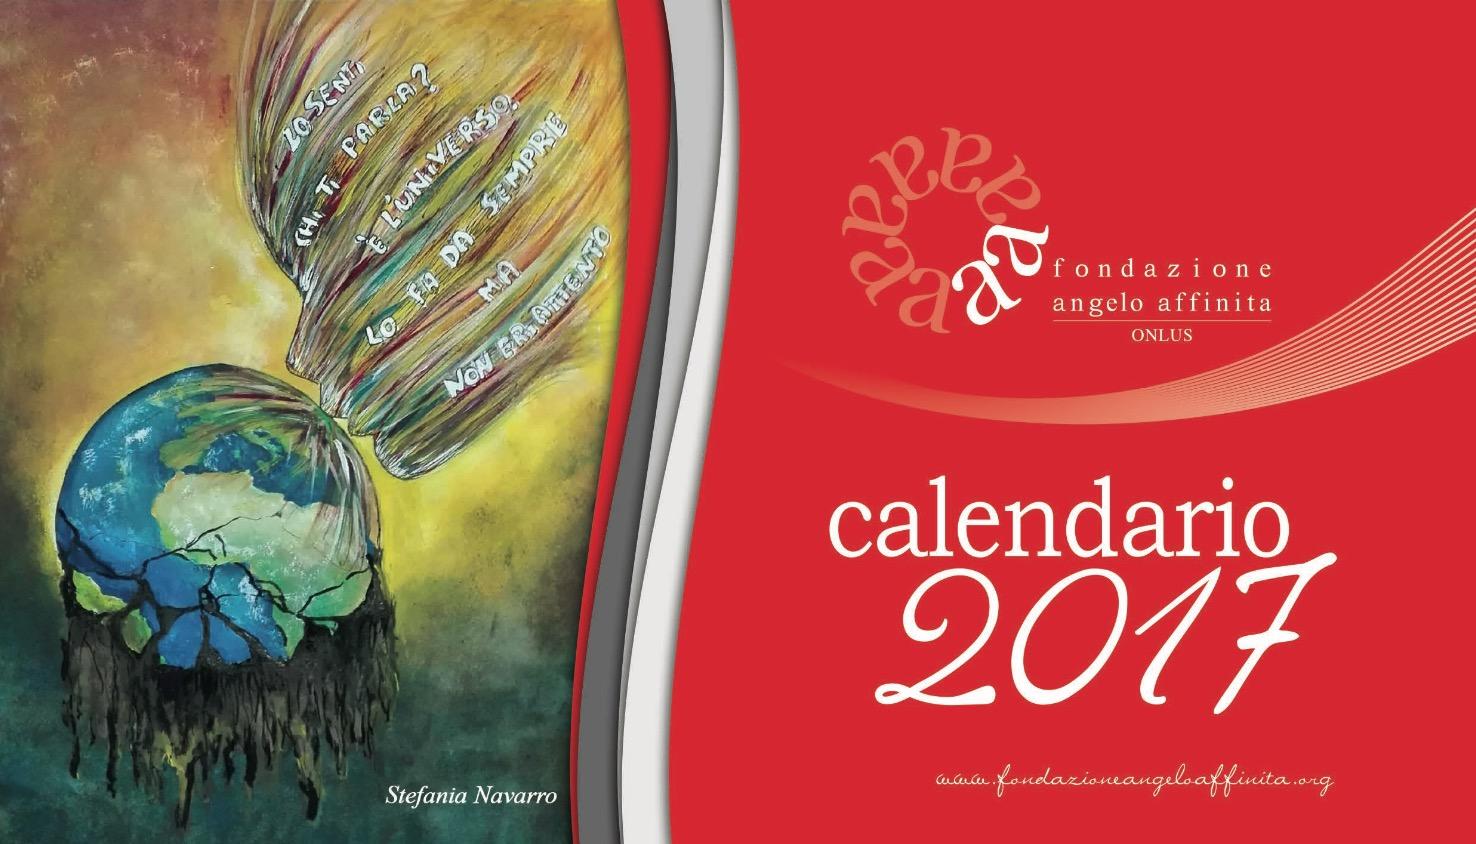 calendario-2017-fondazione-angelo-affinita_1